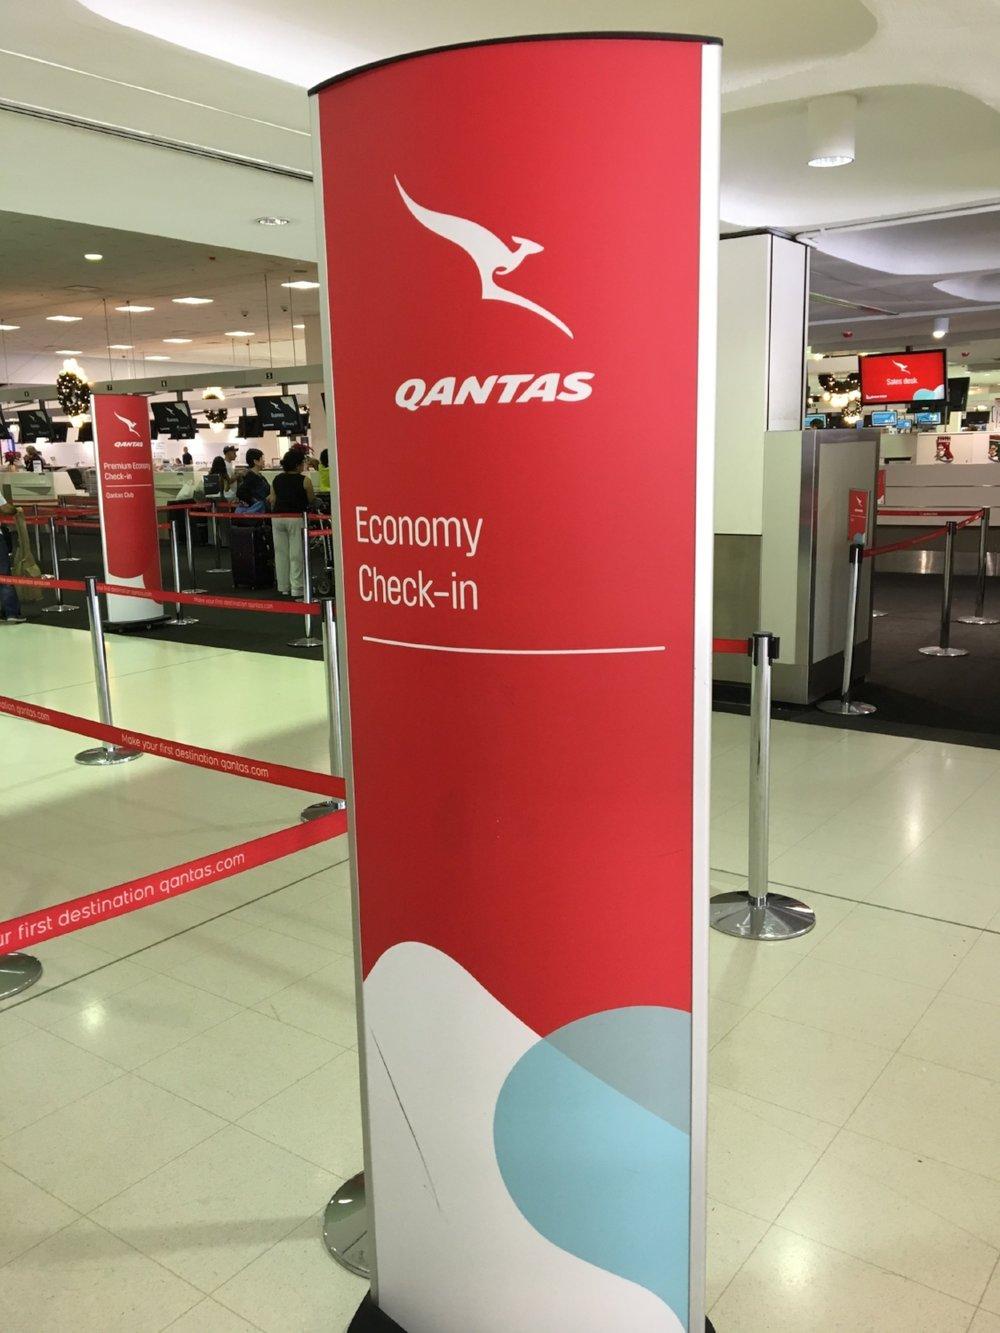 Qantas Economy check-in